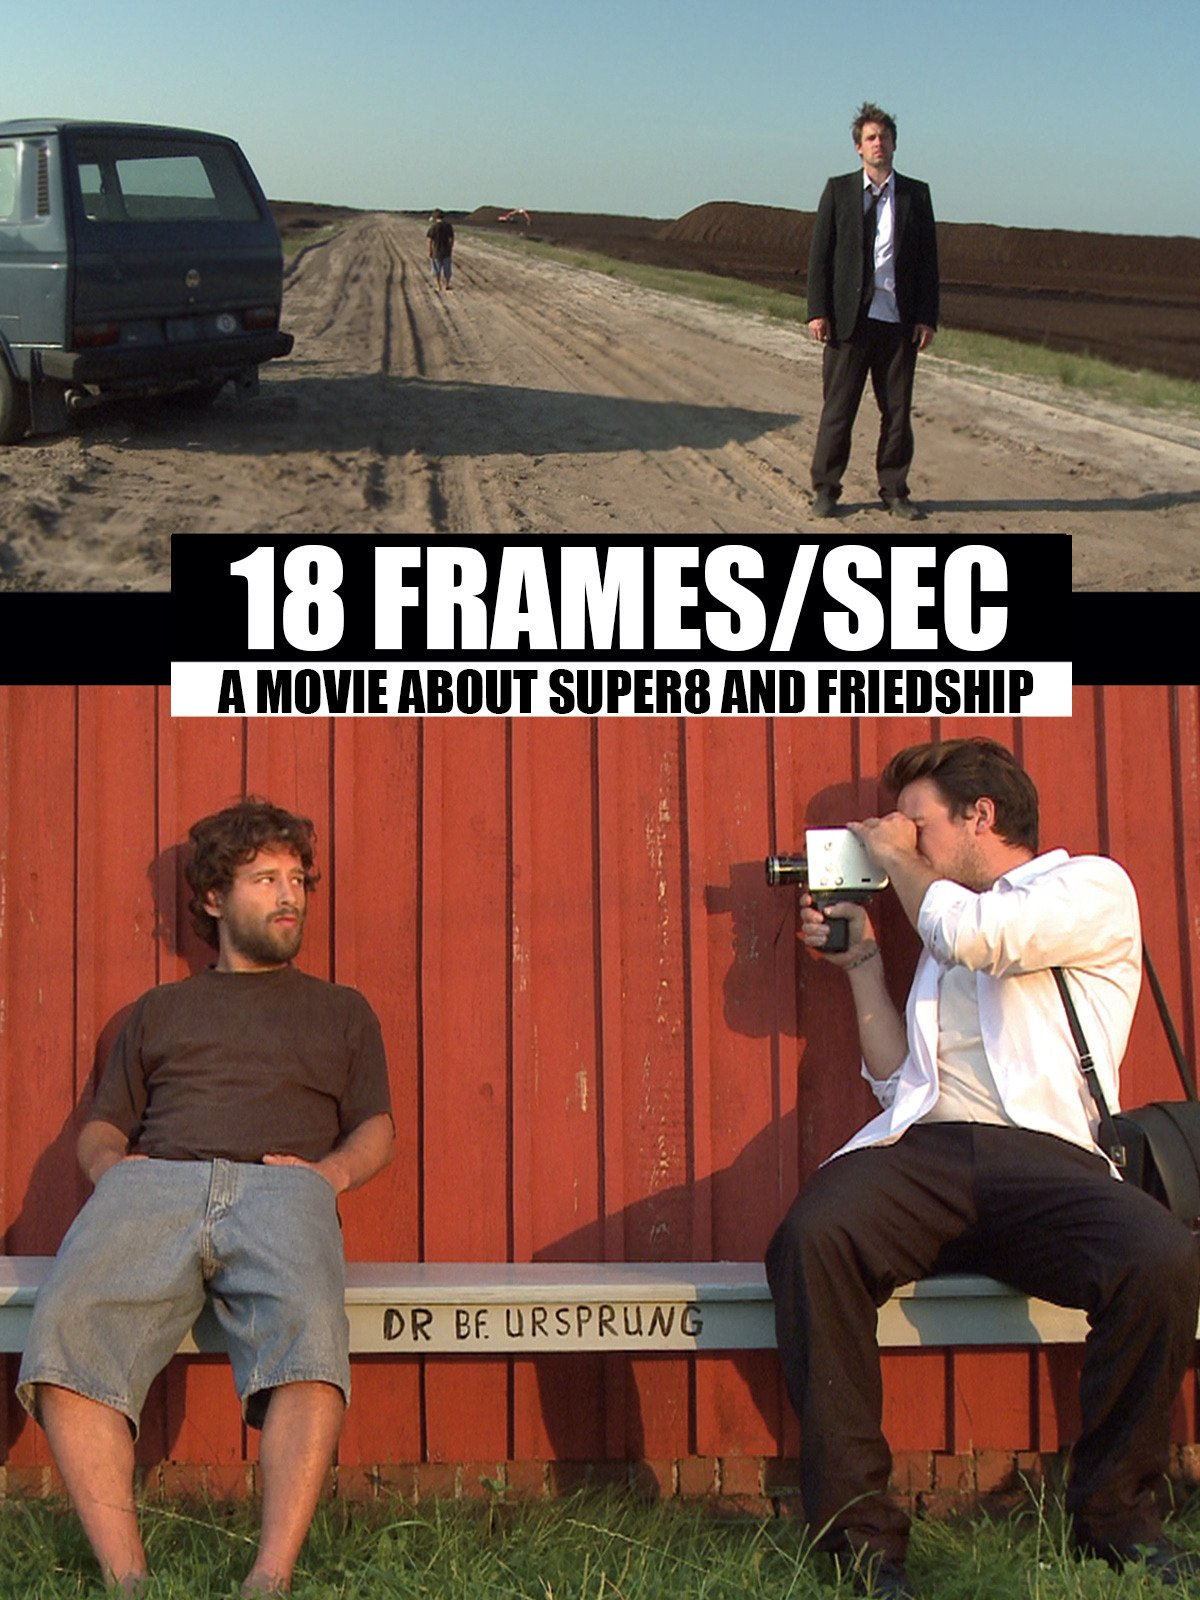 18 Frames/Sec